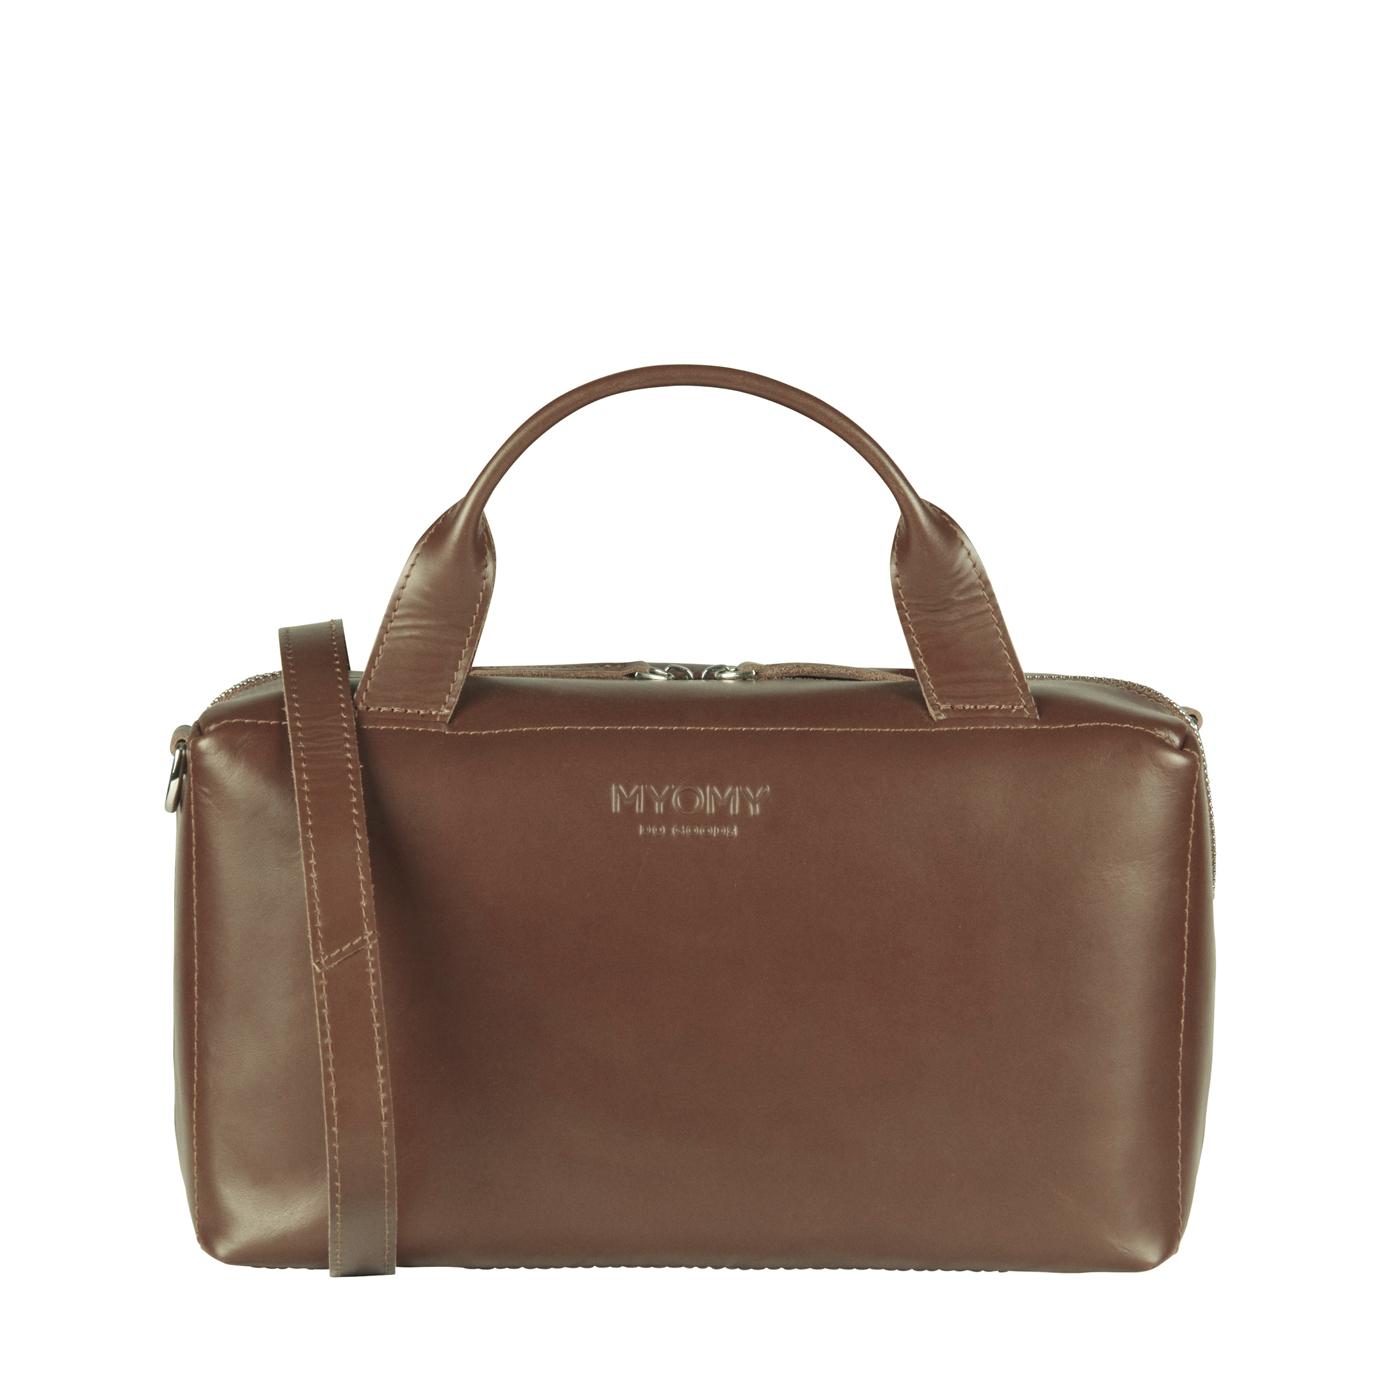 MY BOXY BAG Workbag - hunter waxy original